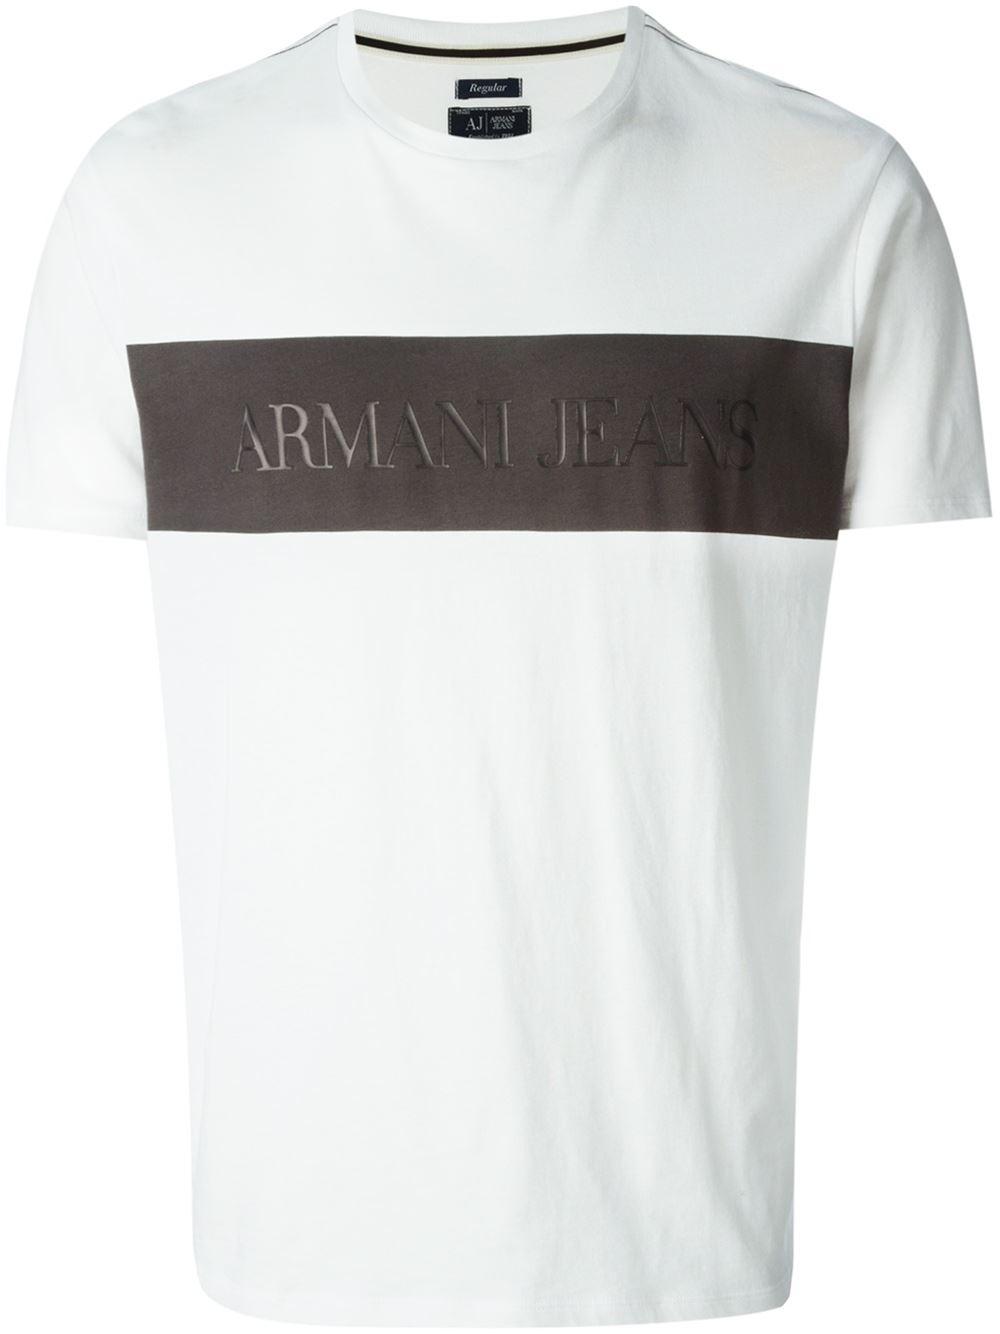 622787eb Armani Jeans Jersey Polo T Shirt Off White | Azərbaycan Dillər ...